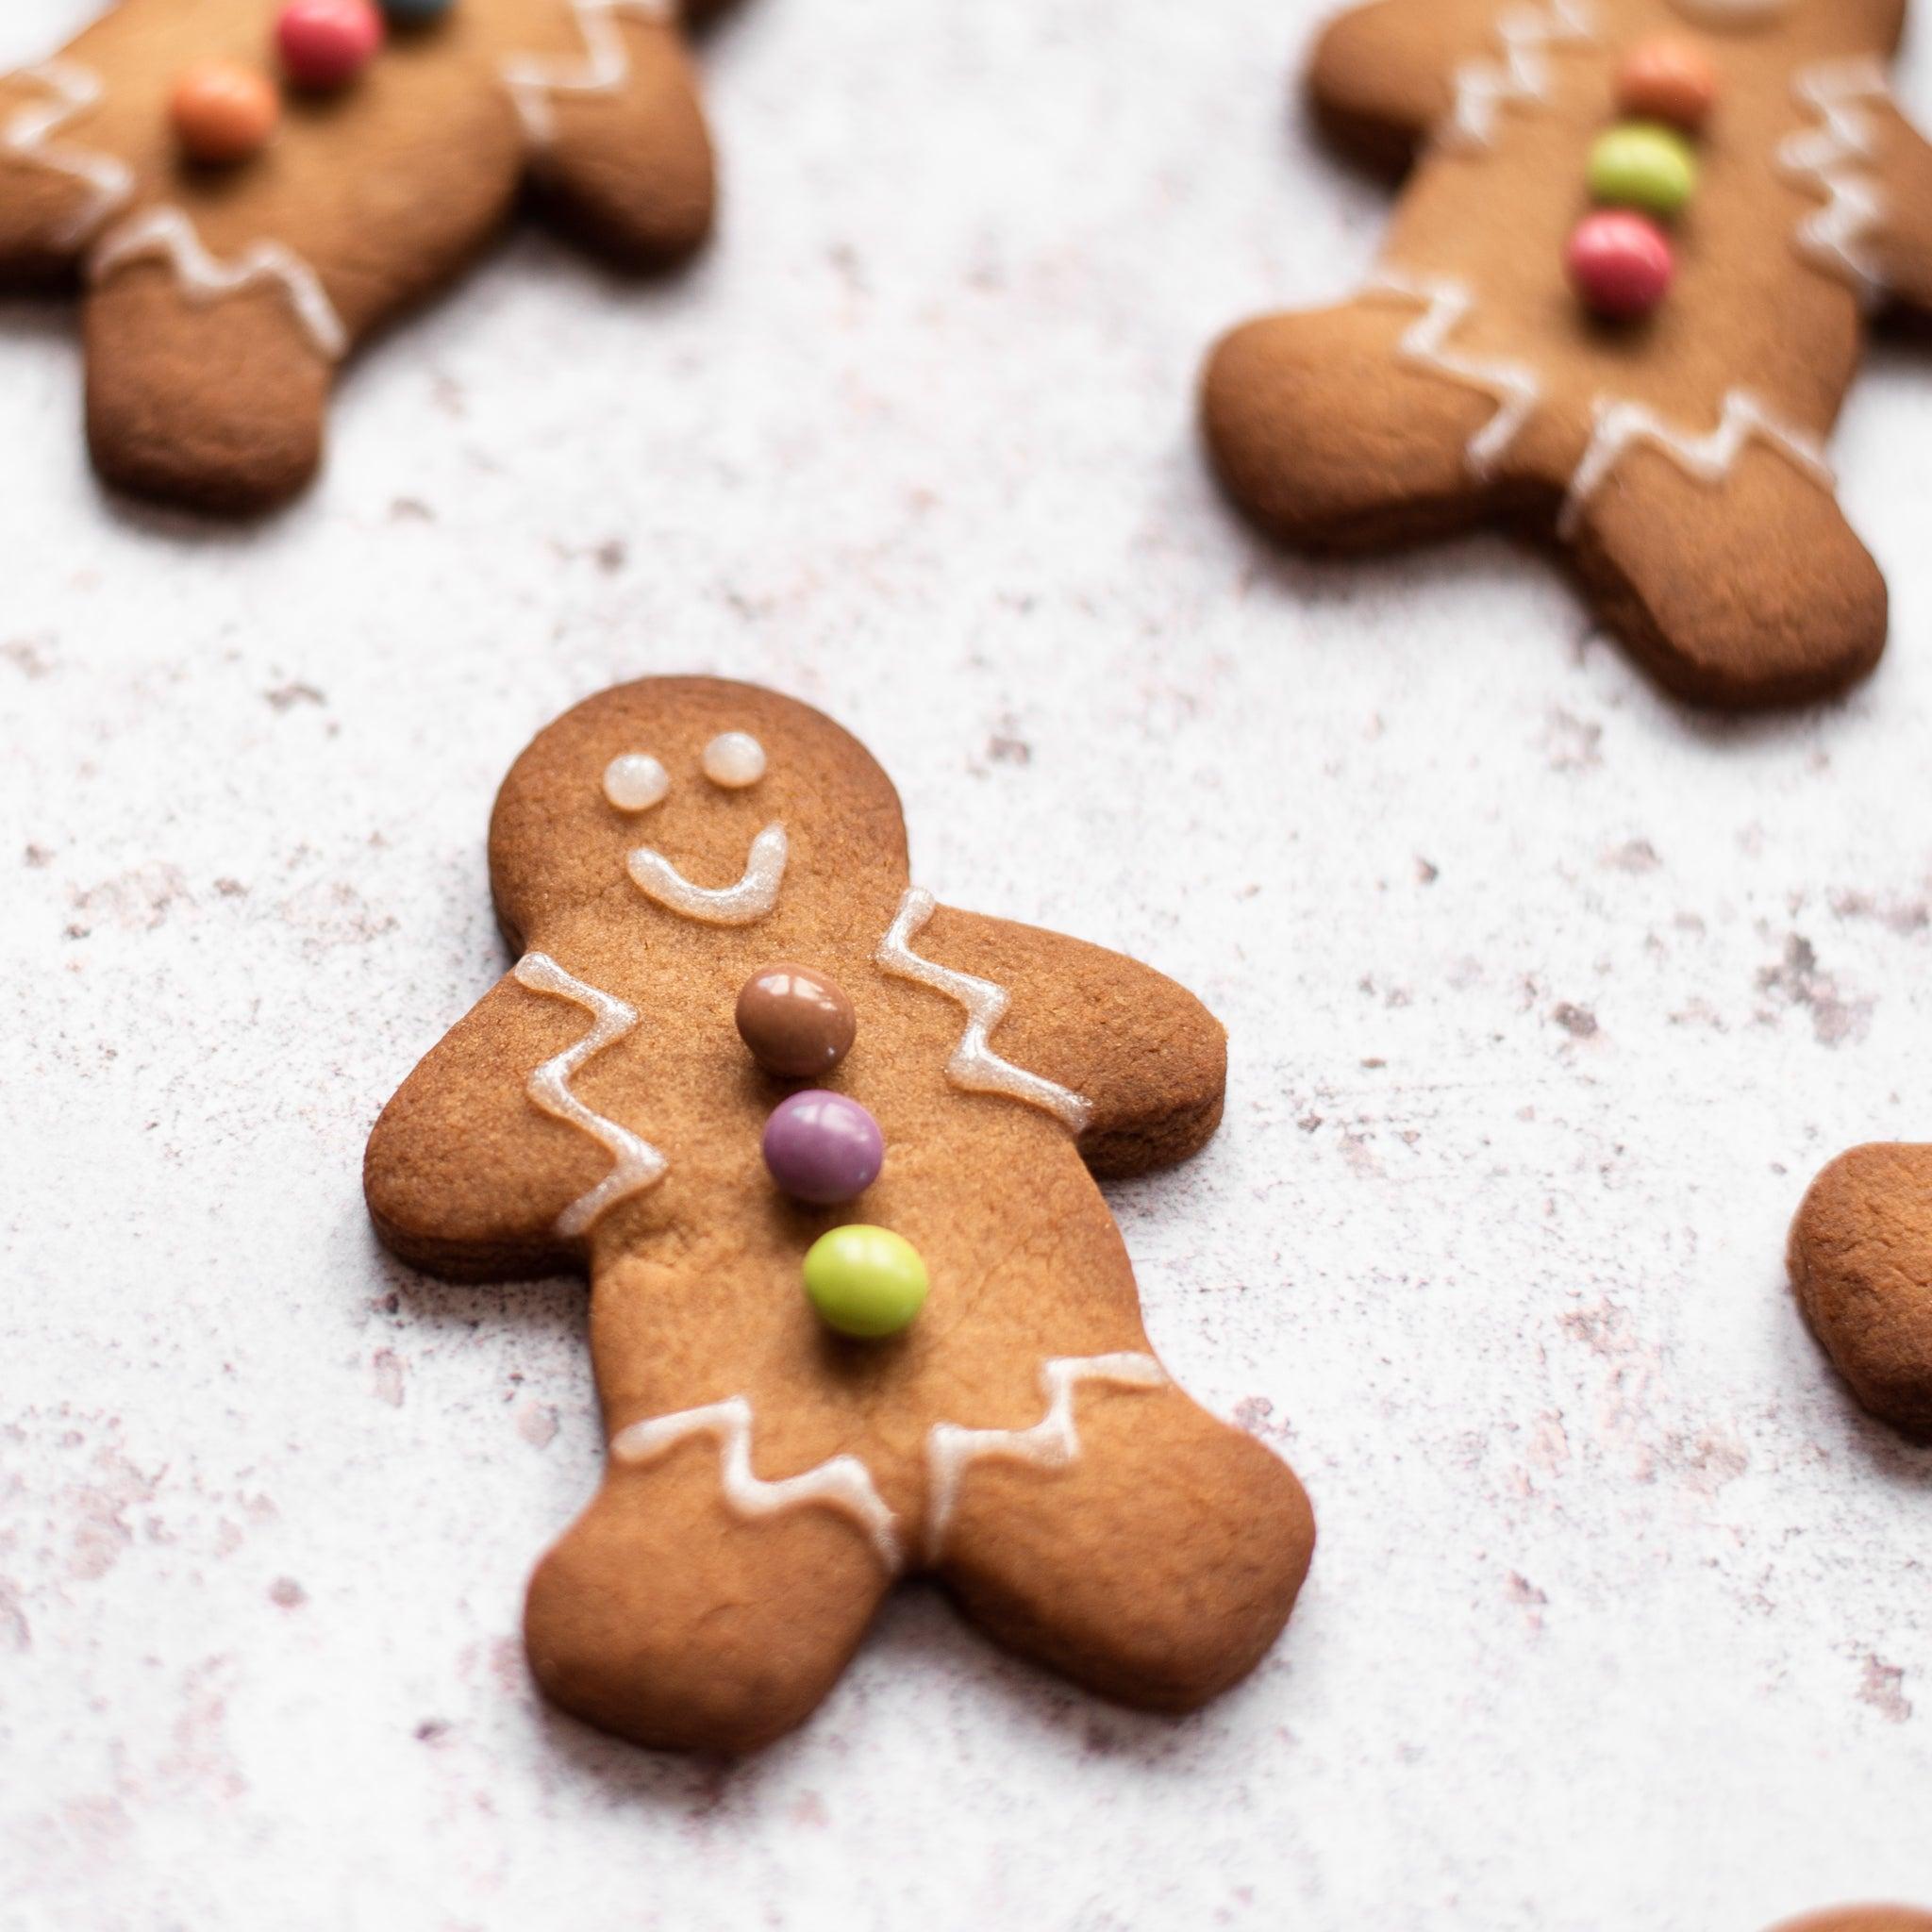 Ultimate-Gingerbread-SQUARE-1.jpg